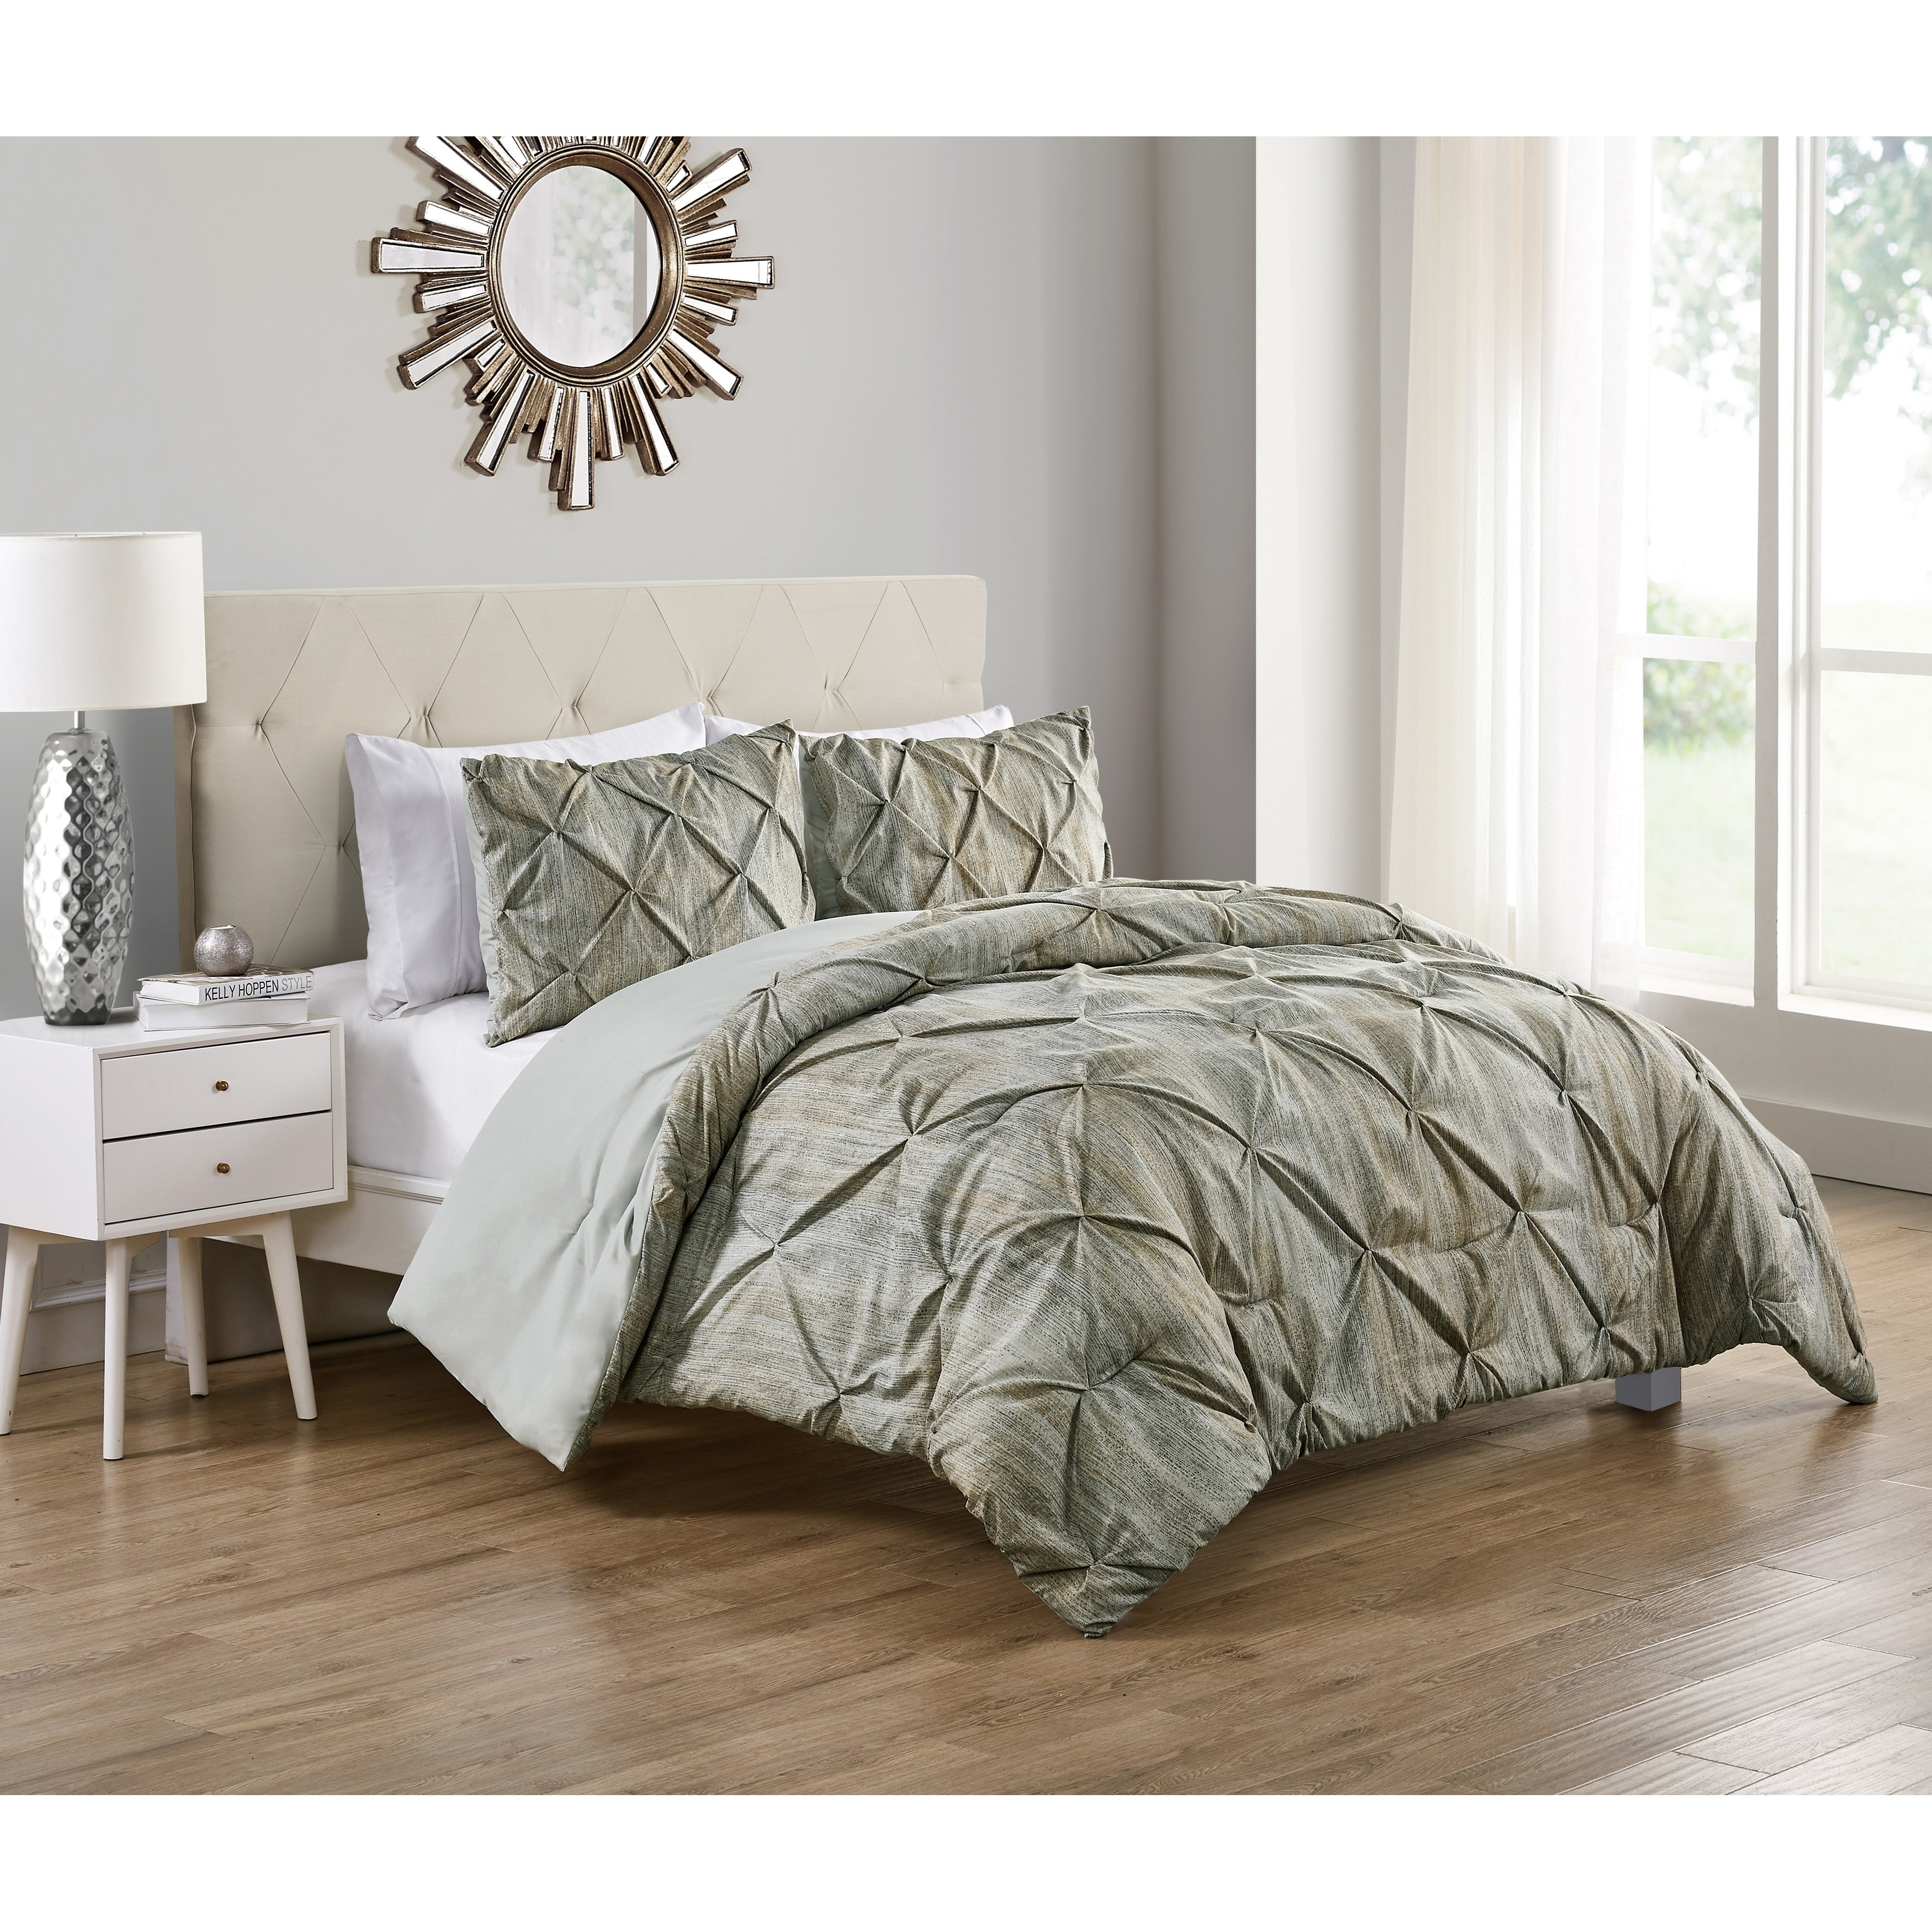 Vcny Home Distressed Karla Beige Pintuck Pleat Duvet Cover Set King Beige Walmart Com Walmart Com